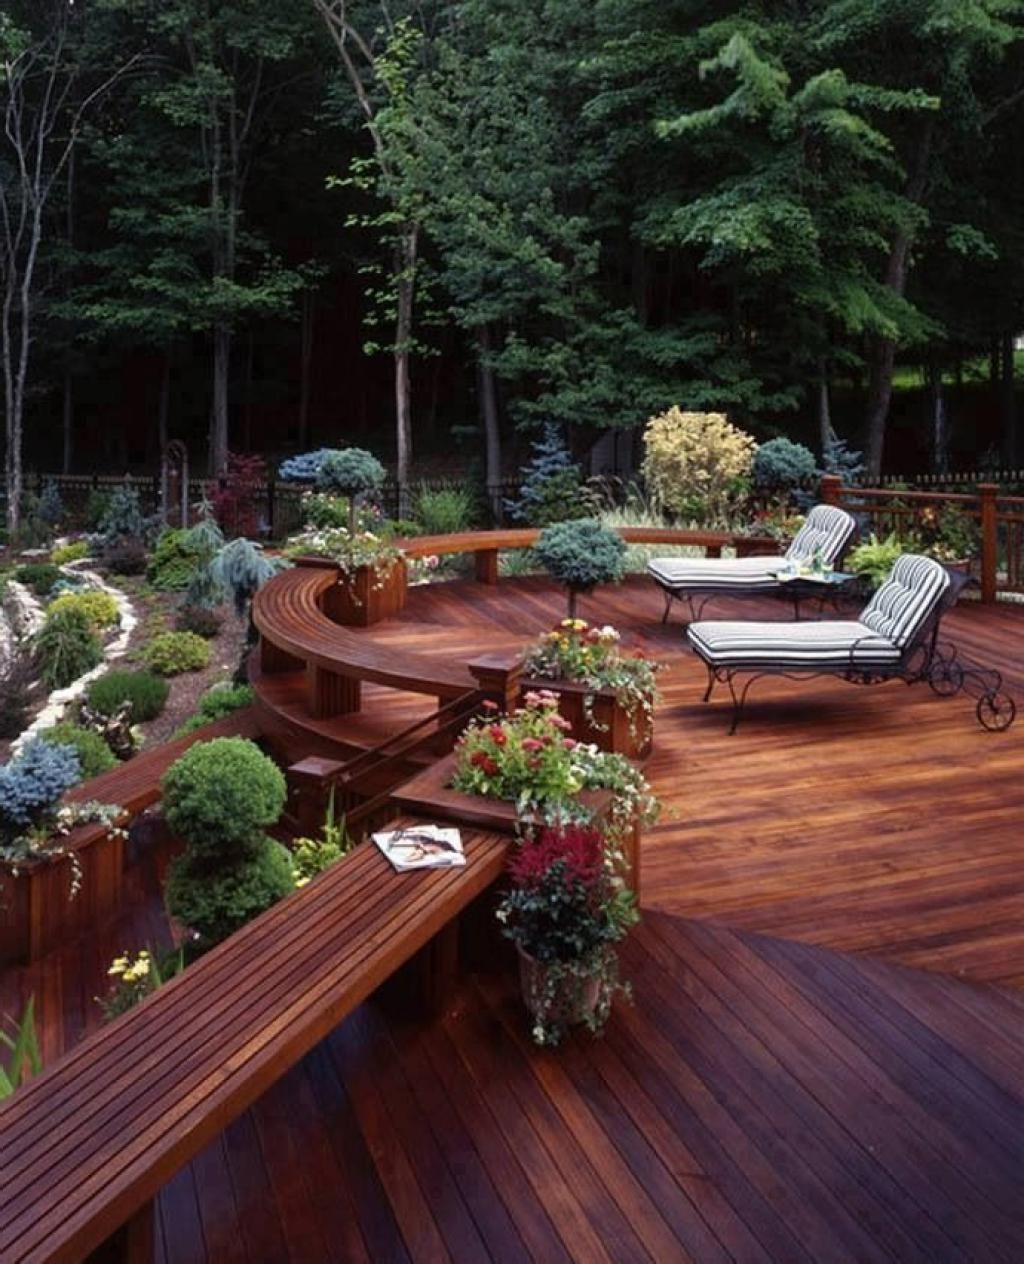 30 Outstanding Backyard Patio Deck Ideas To